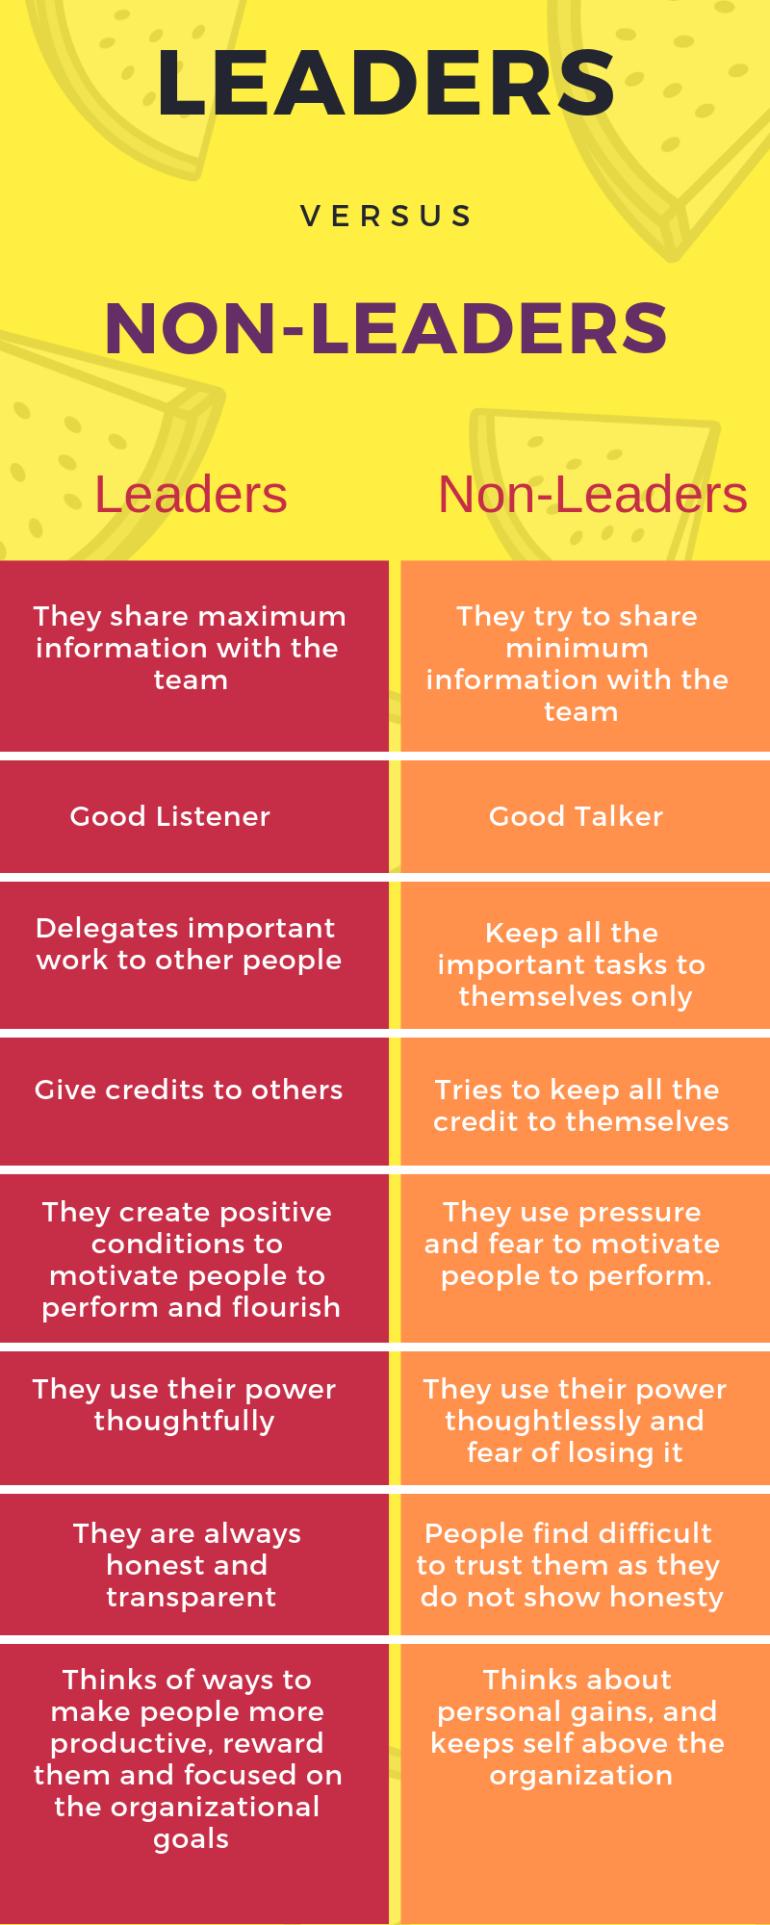 Leaders vs non-leaders.png